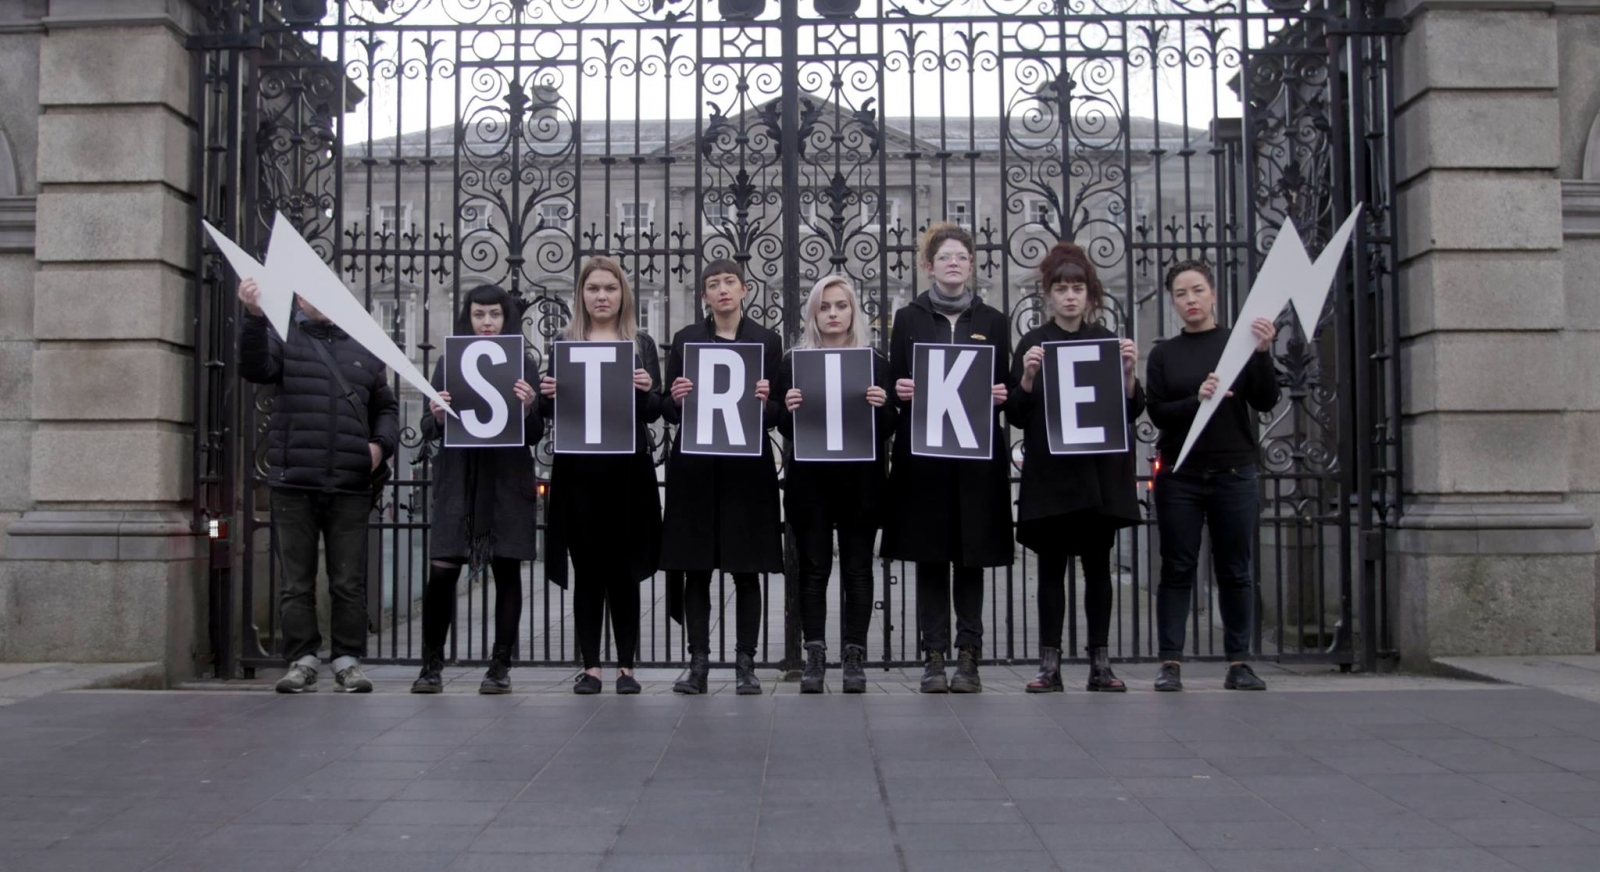 Irish women strike to change abortion laws